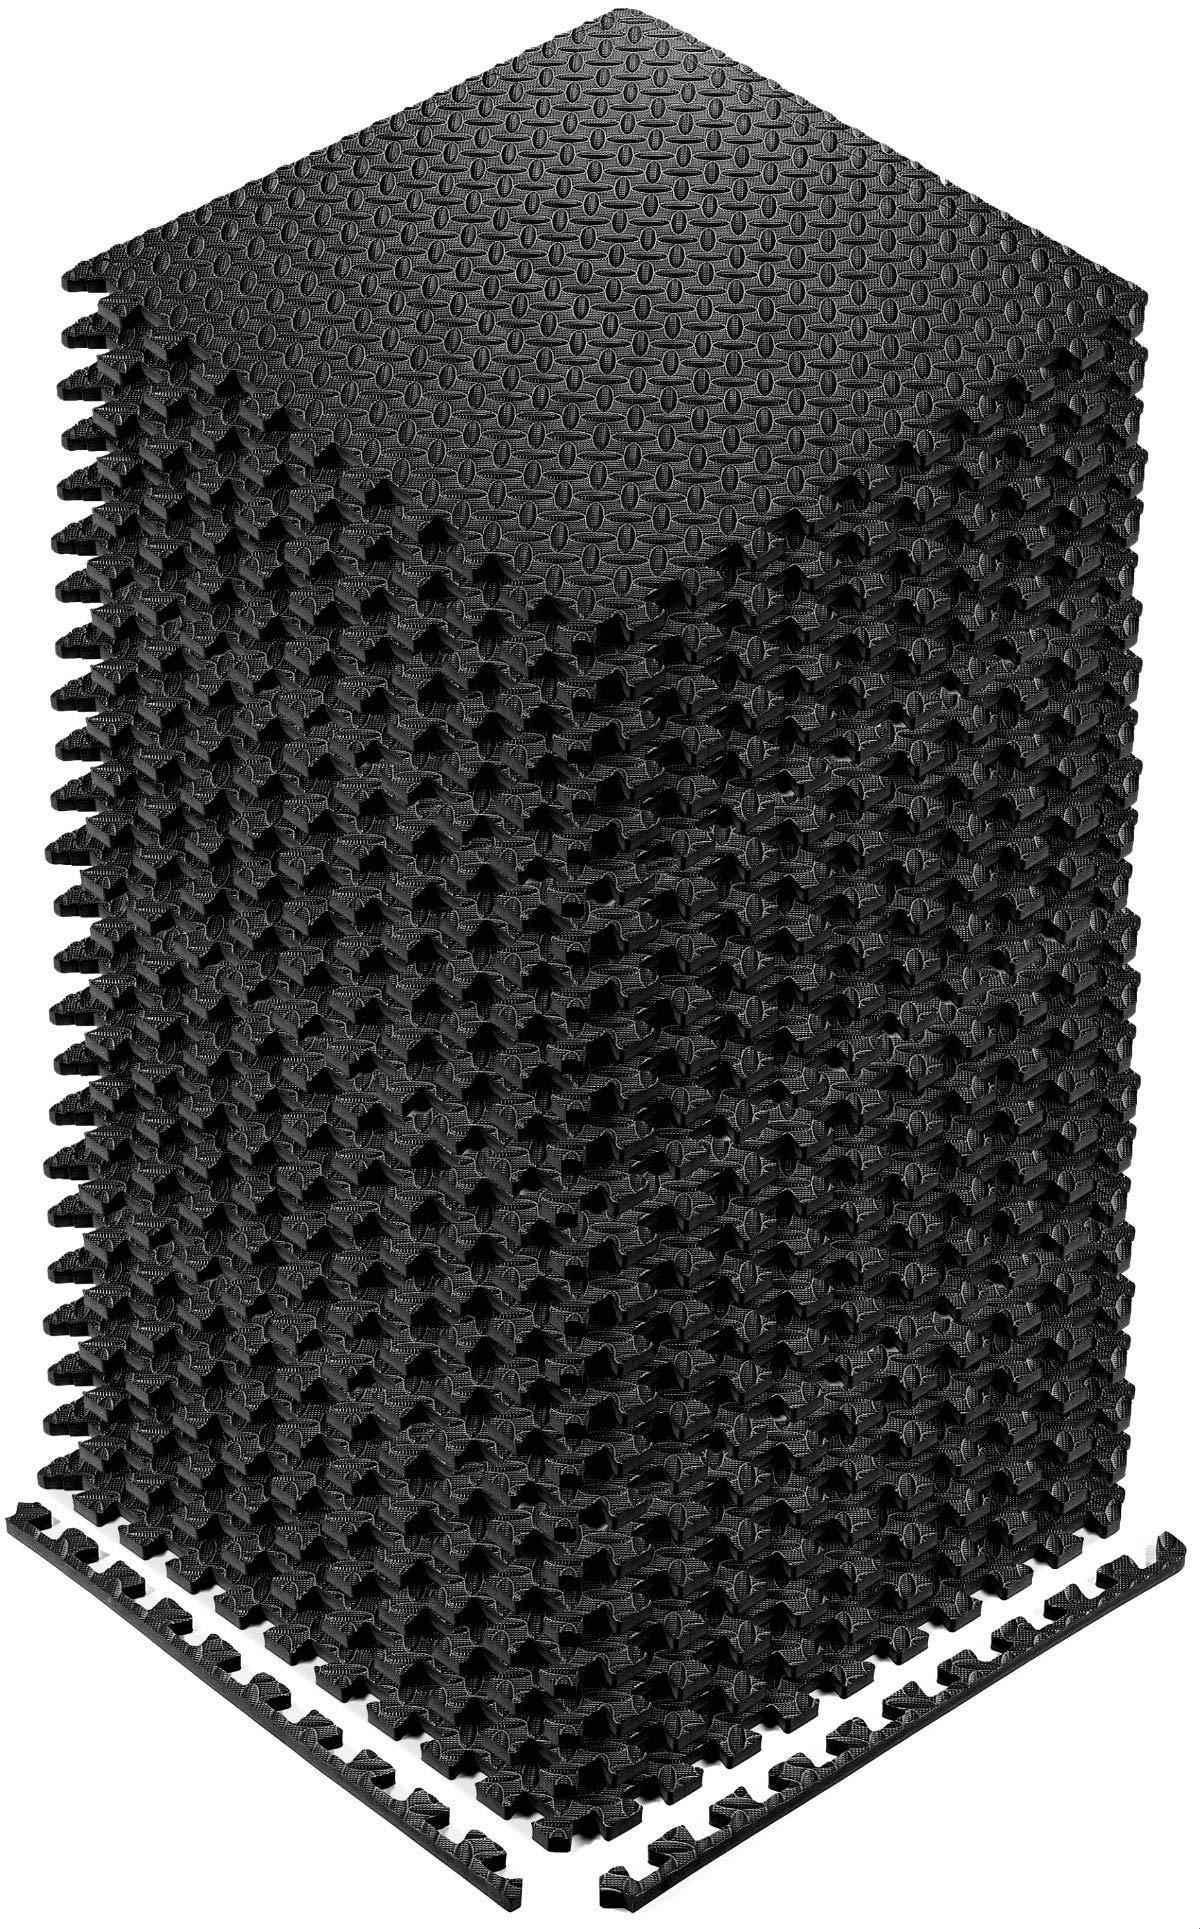 YOGU Puzzle Exercise Floor Mat EVA Interlocking Foam Tiles 24 Tiles Covers 96 SQ Foot Exercise Equipment Mat Protective Flooring for Home Gym (Black)